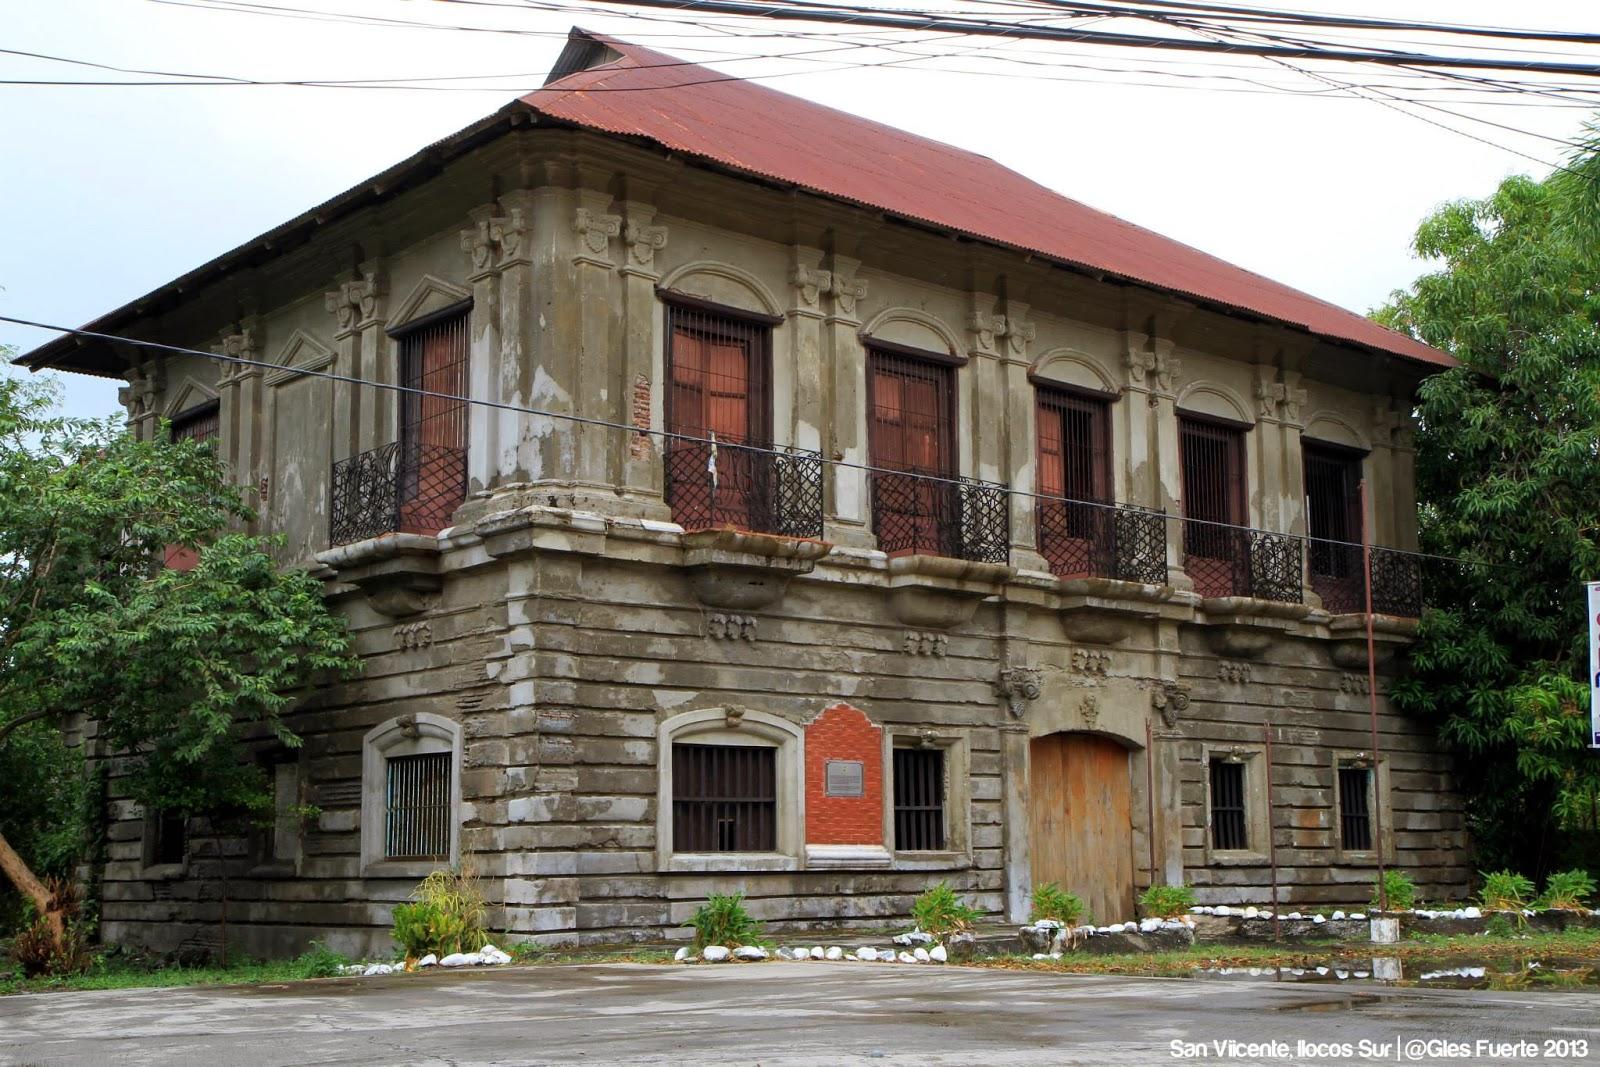 San Vicente (Ilocos Sur) Philippines  City pictures : ... .Dream.Discover: Exploring the Church of San Vicente Ilocos Sur